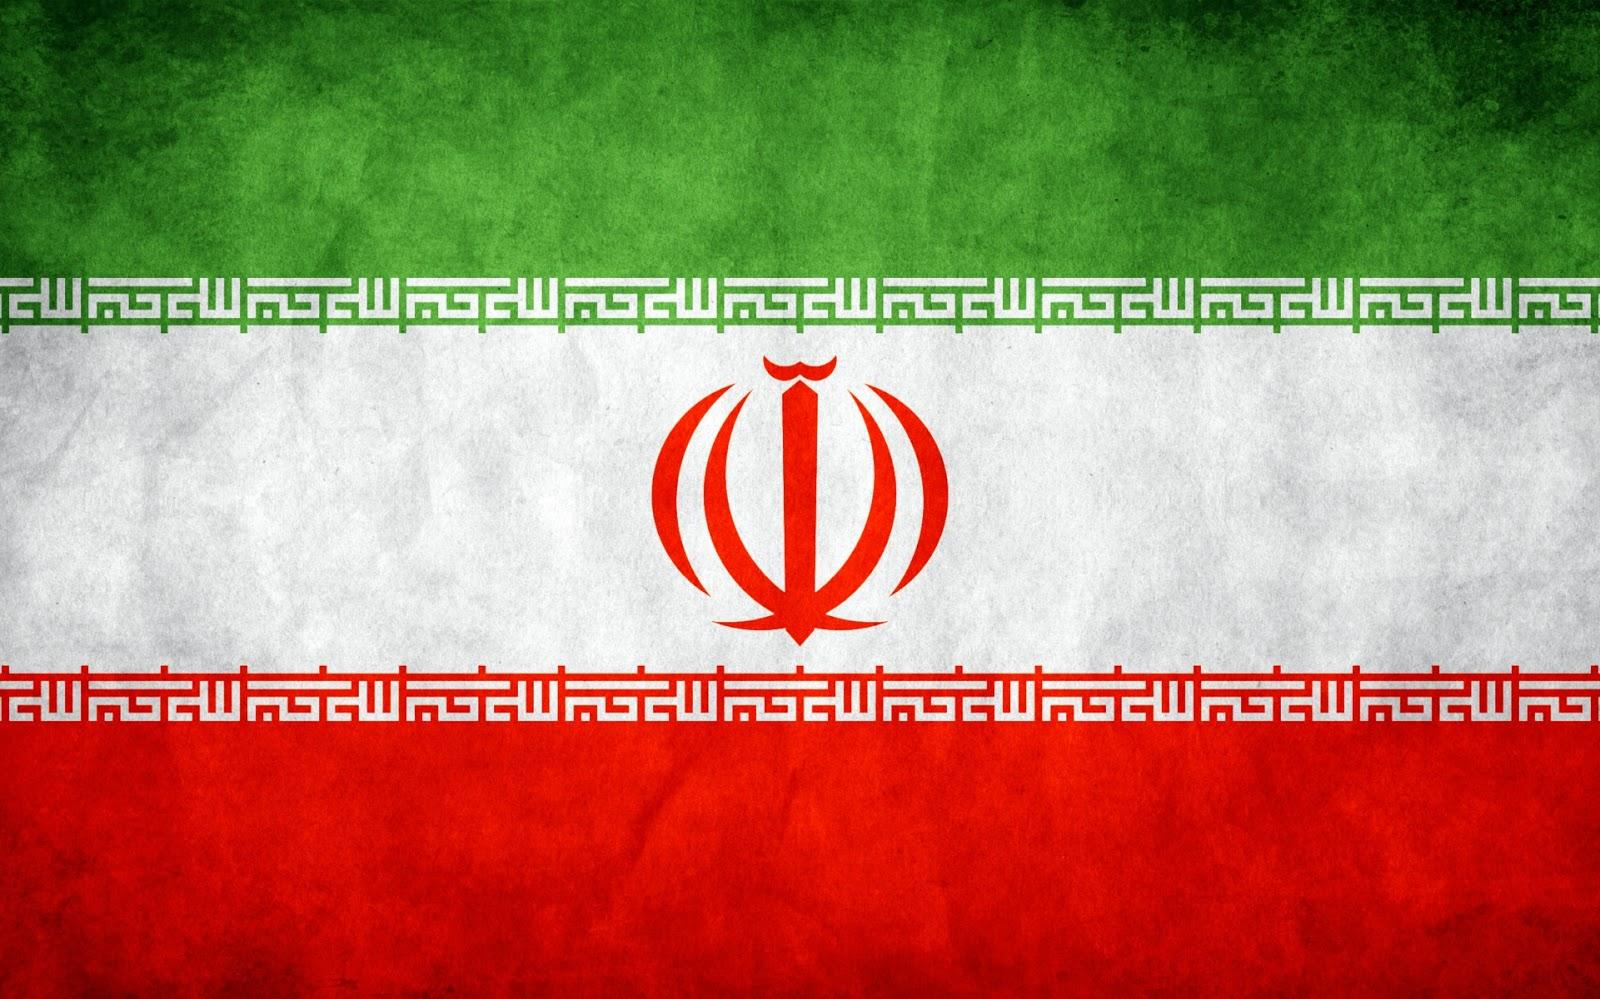 Cute Wallpaper In Twitter Hd Wallpaper Download Iran Flag Hd Wallpaper Free Download